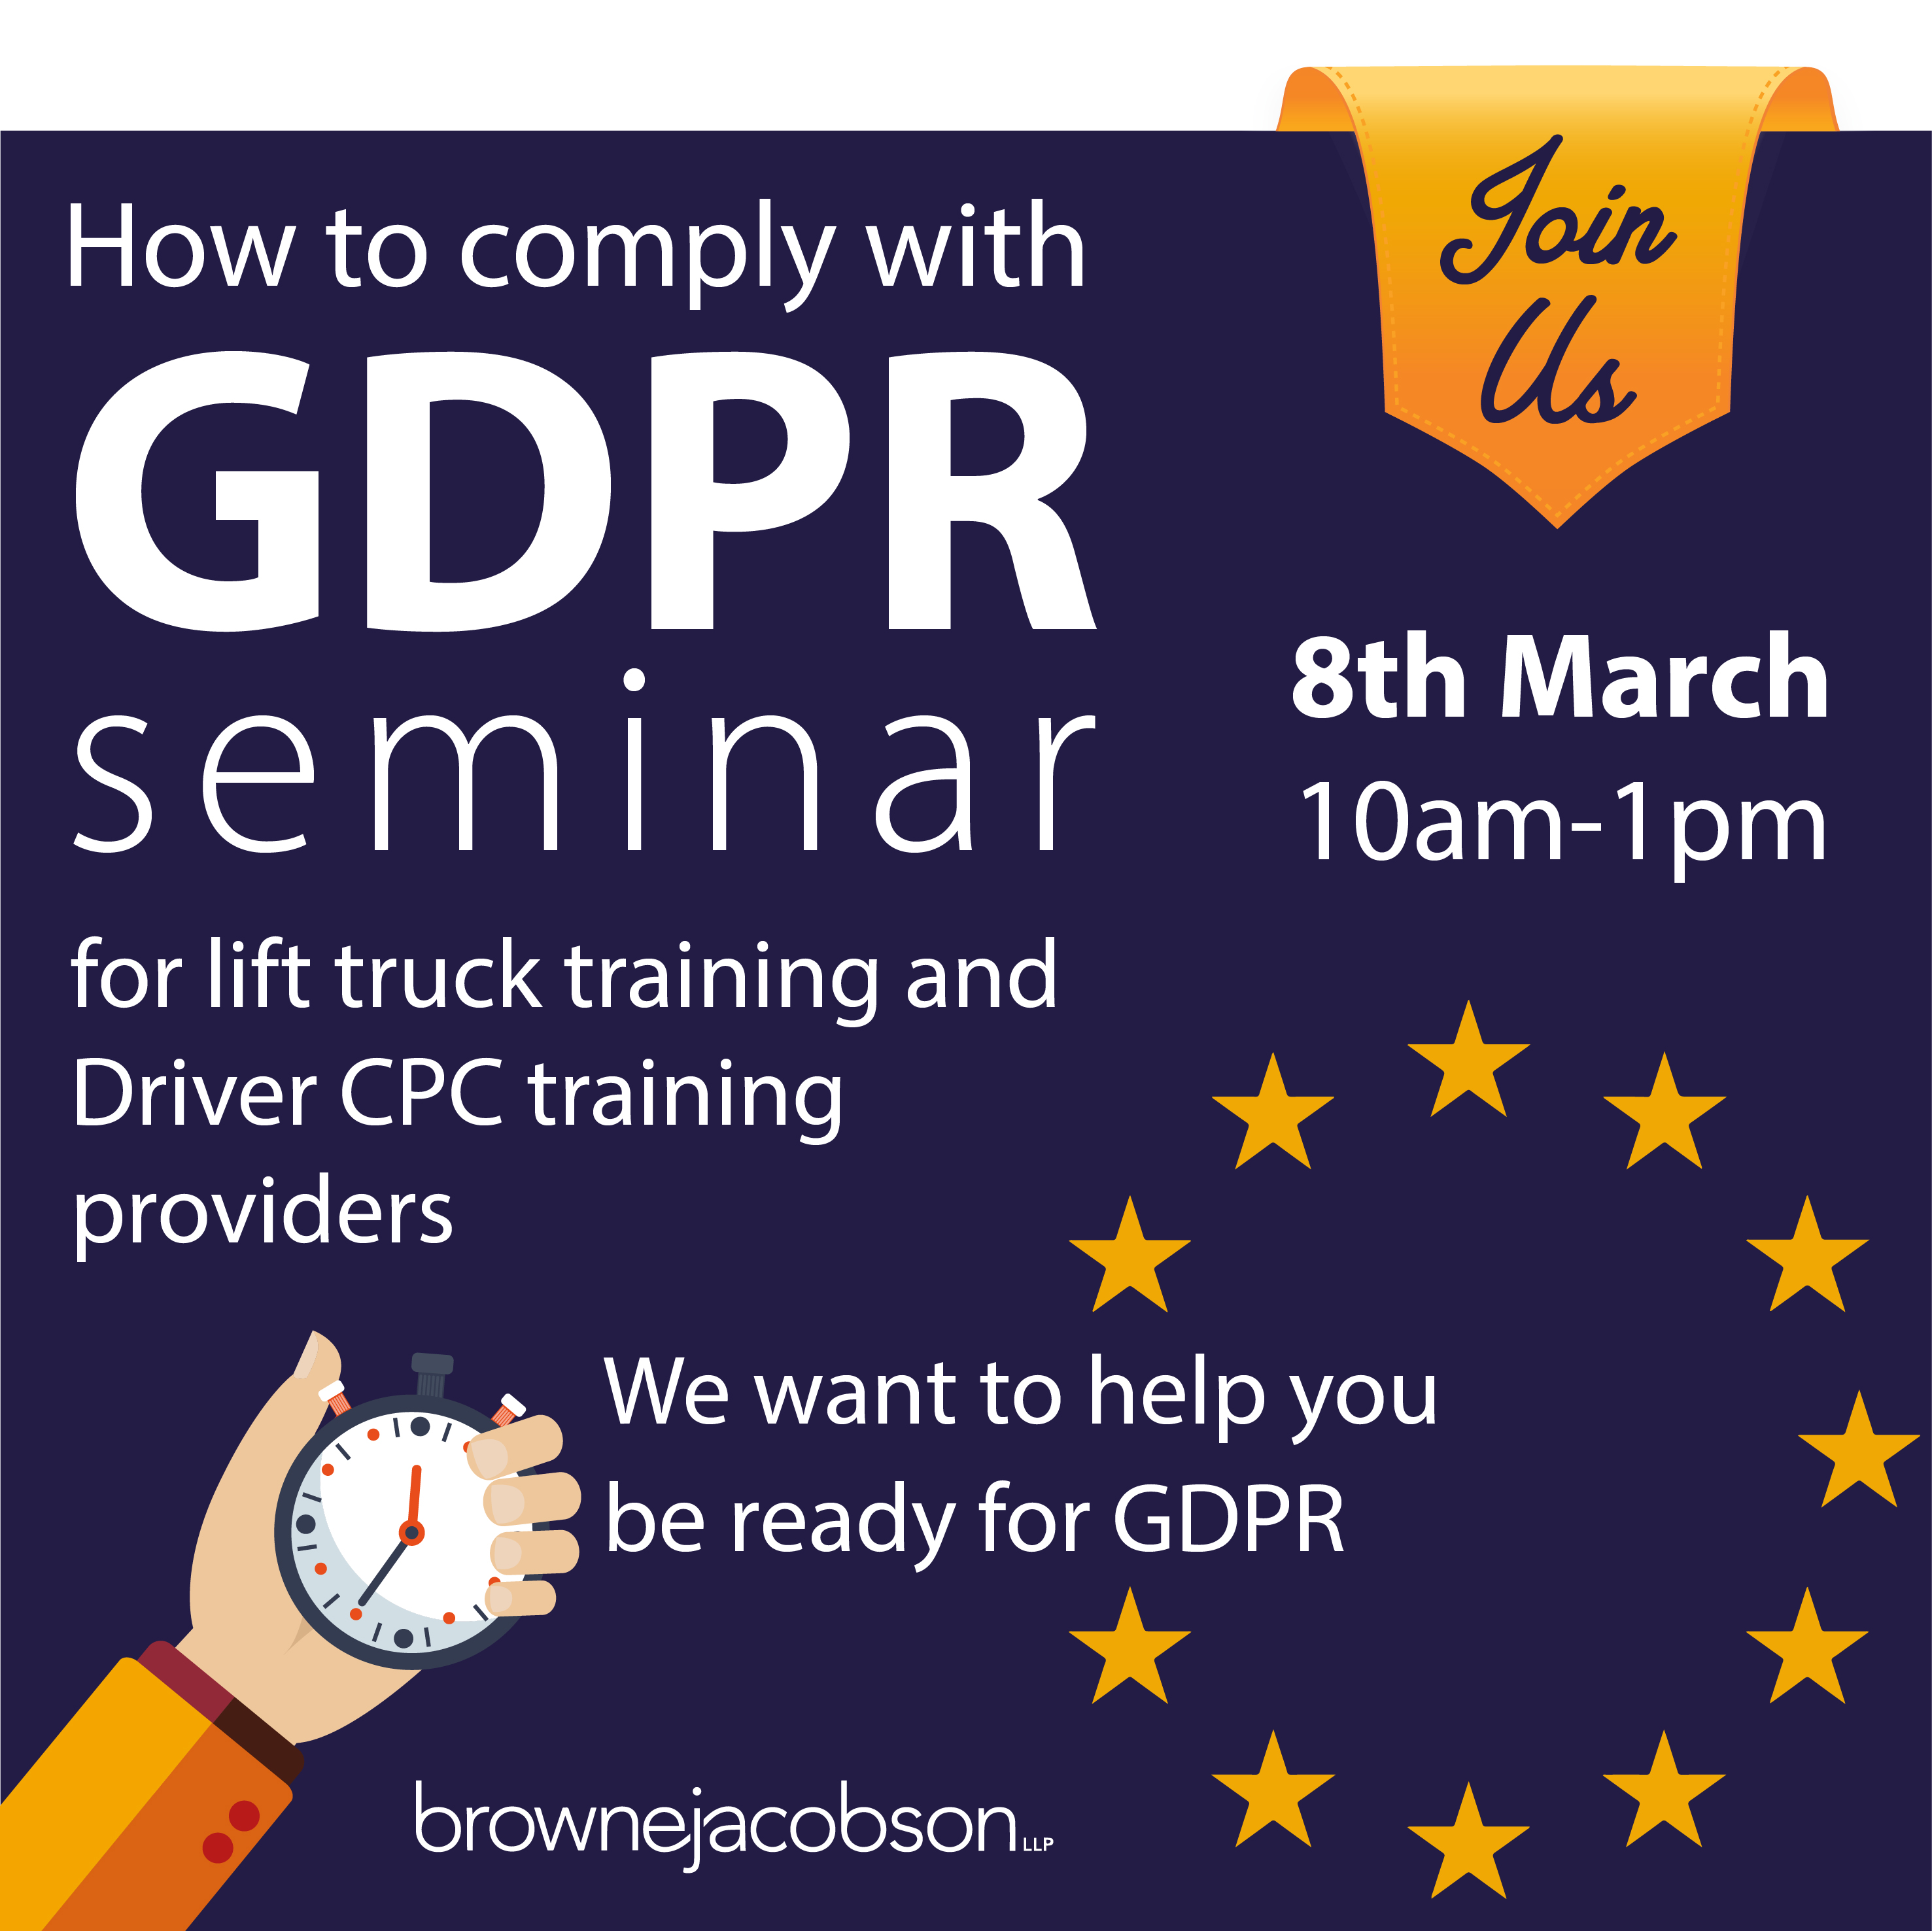 RTITB to Host GDPR Event